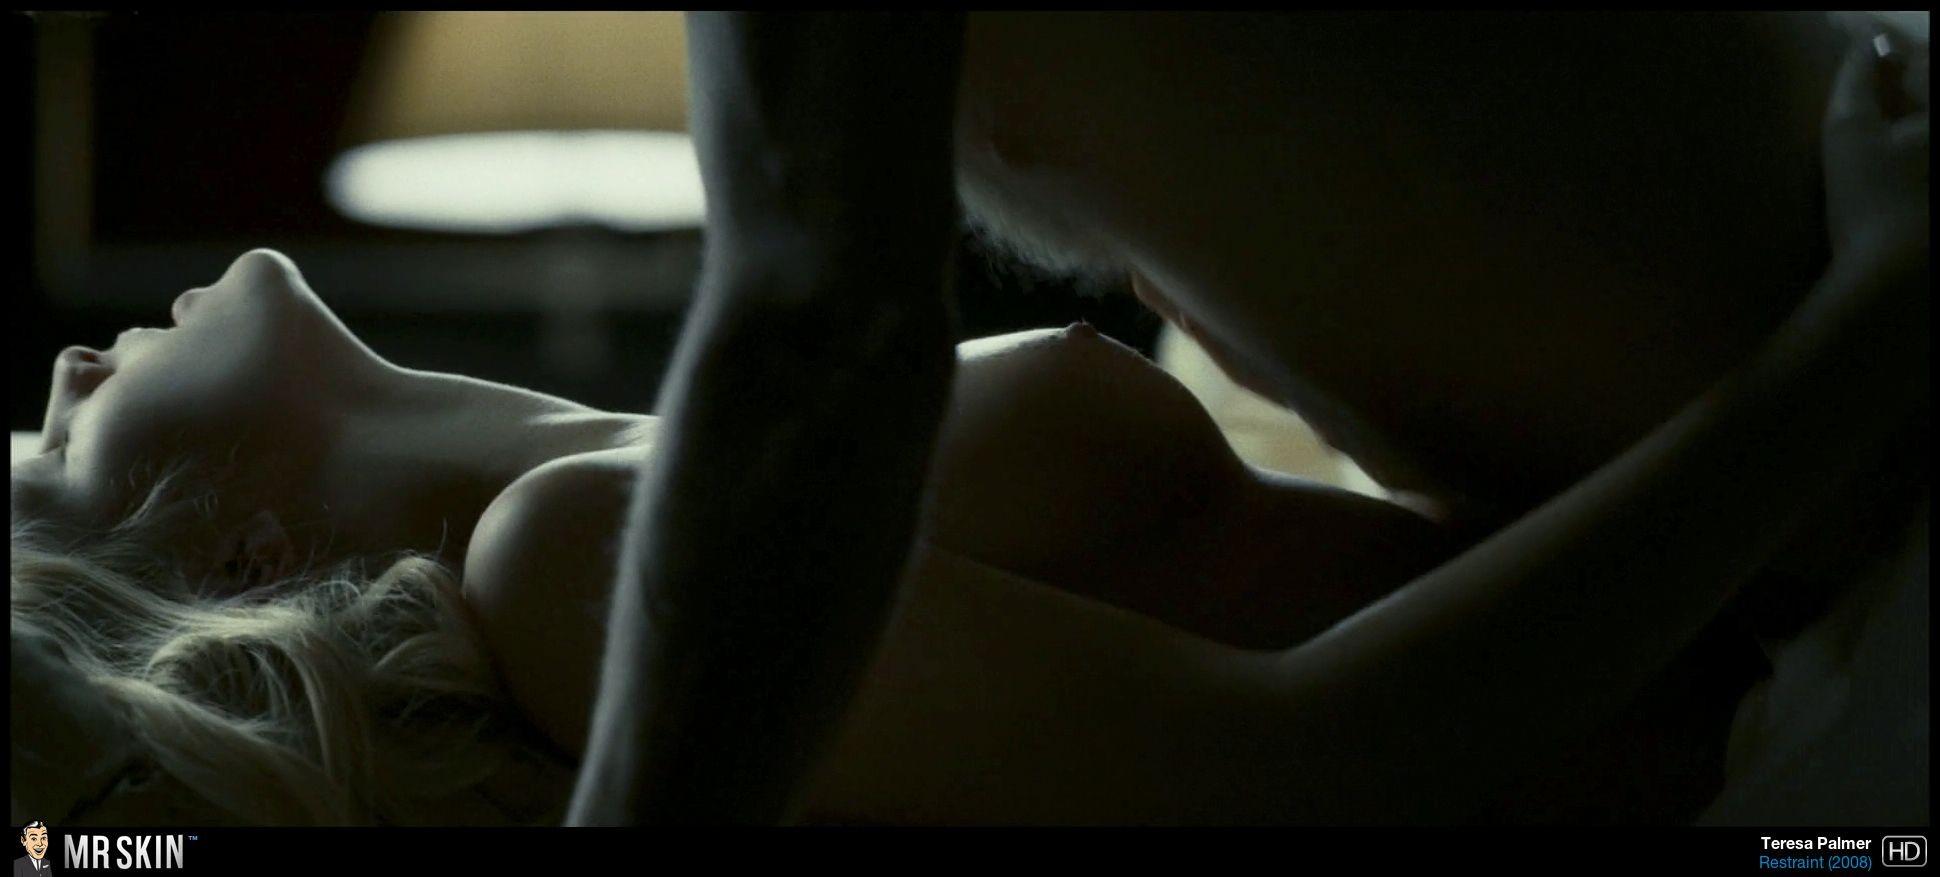 fotos Teresa Palmer desnuda